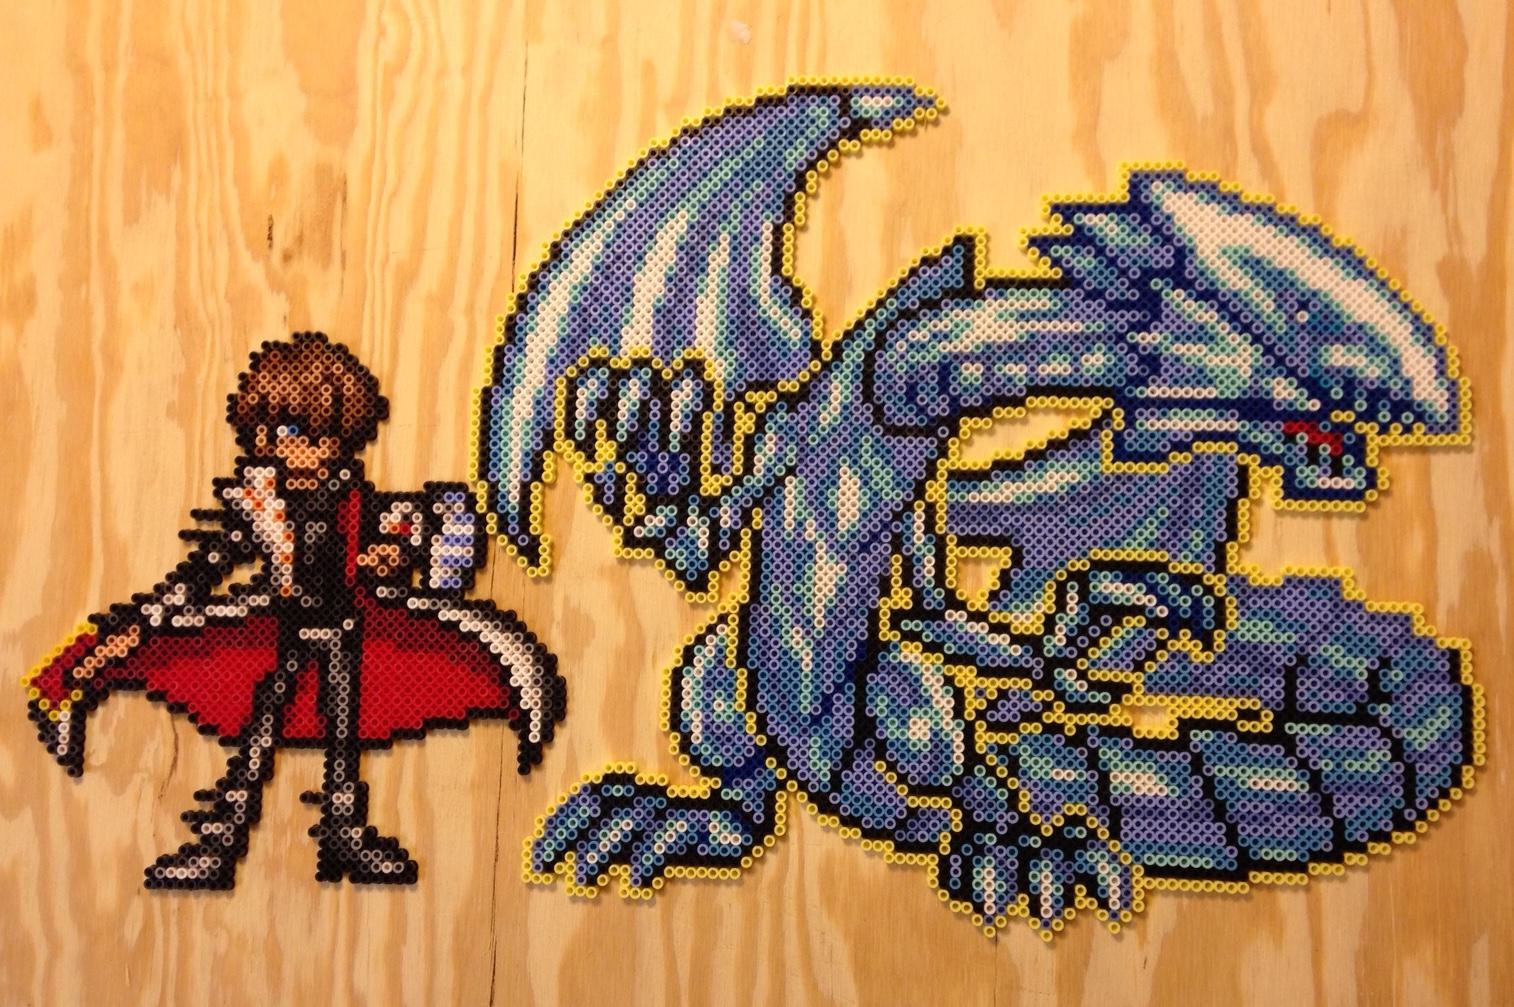 go blue eyes white dragon by ellsworth toohey on deviantart